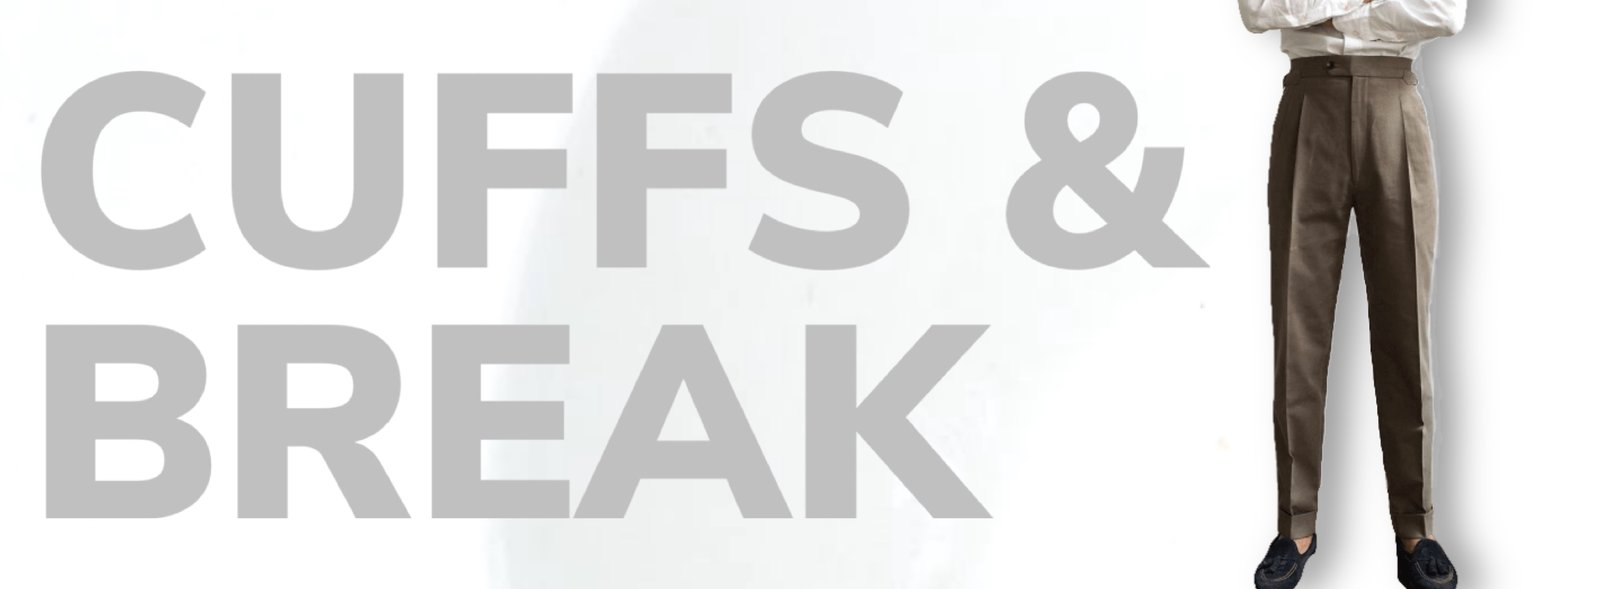 3FBAFF36-740A-4672-8746-FEC455524832.jpeg